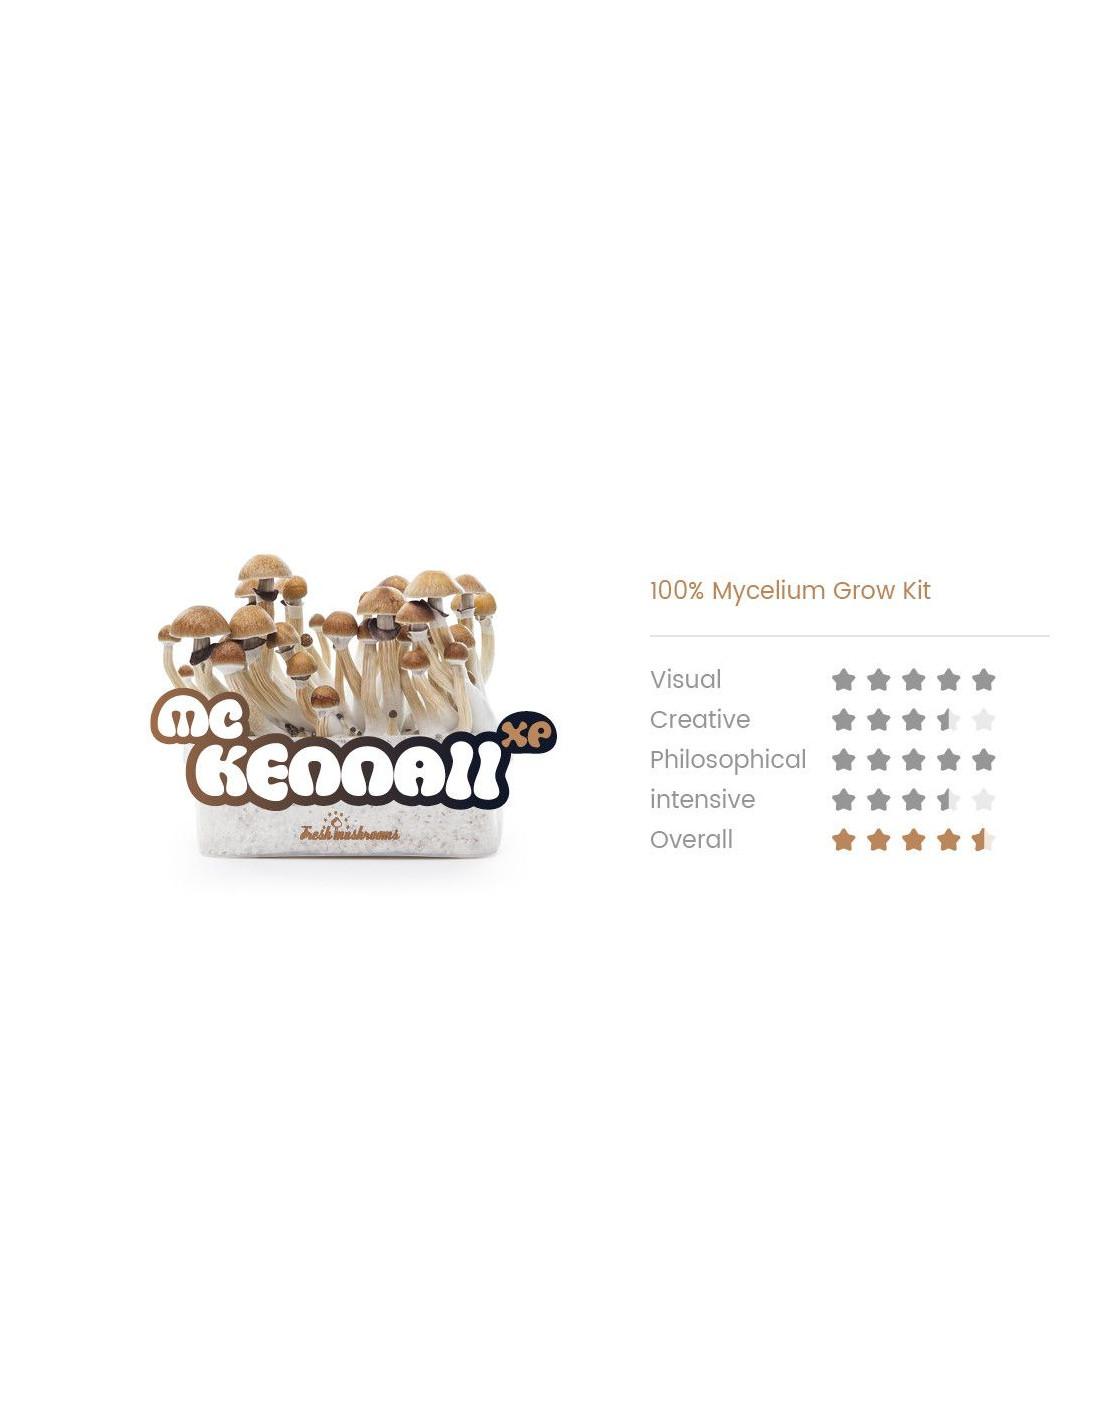 https://mycotrop.com/731-thickbox_default/mc-kennaii-champignons-magiques-growkit.jpg